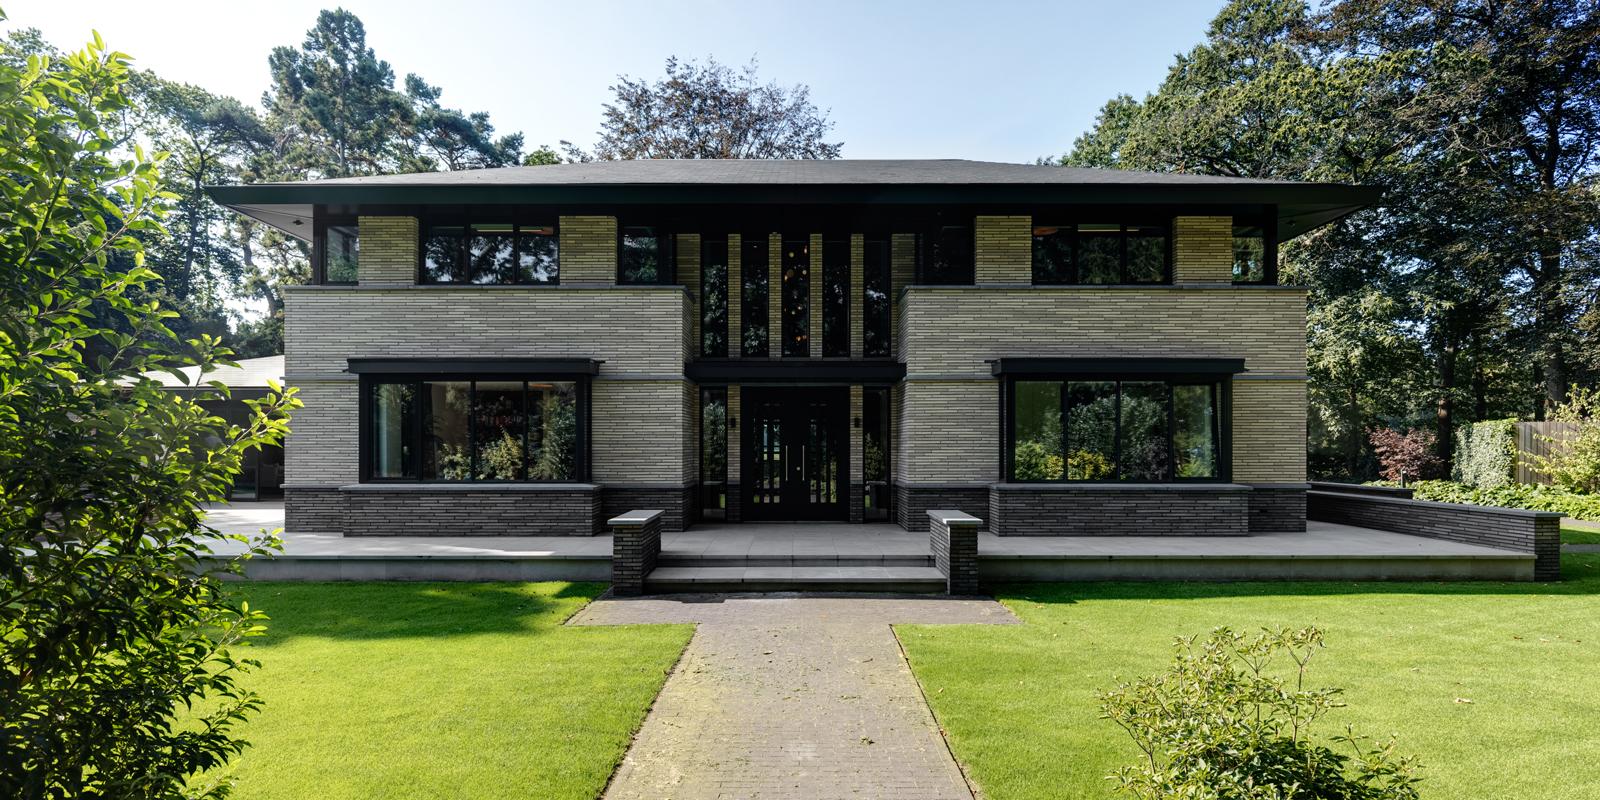 Wonen in de natuur, Voss architecture, Sfeervolle villa